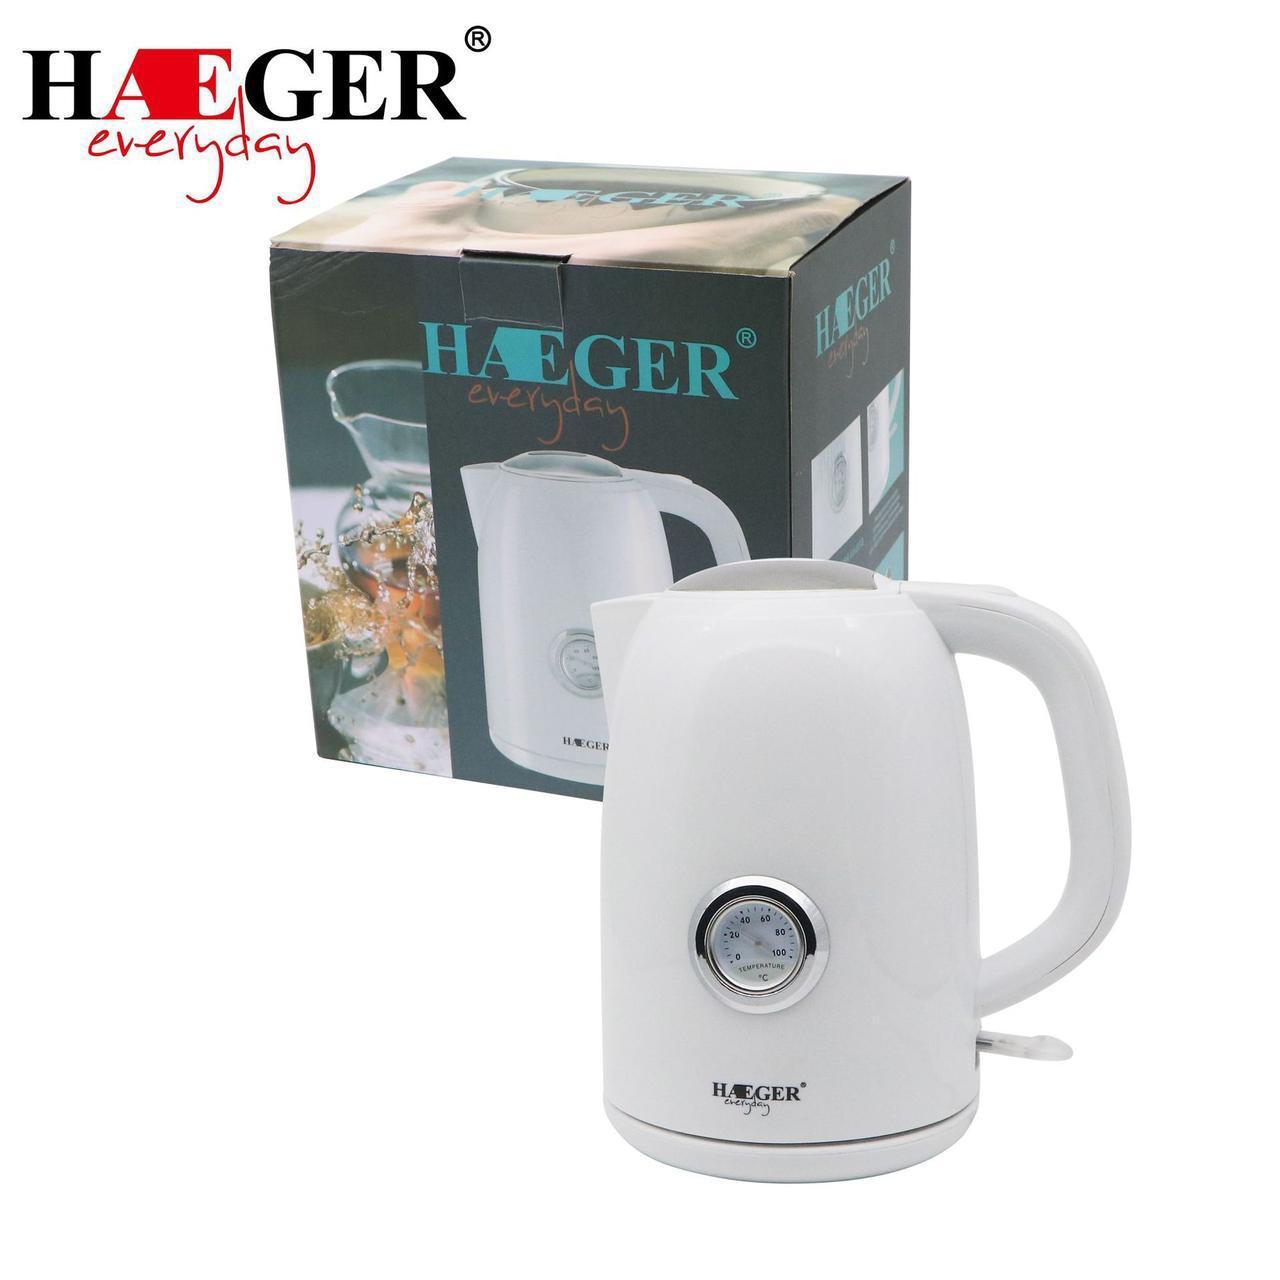 Электрический чайник Haeger HG7812